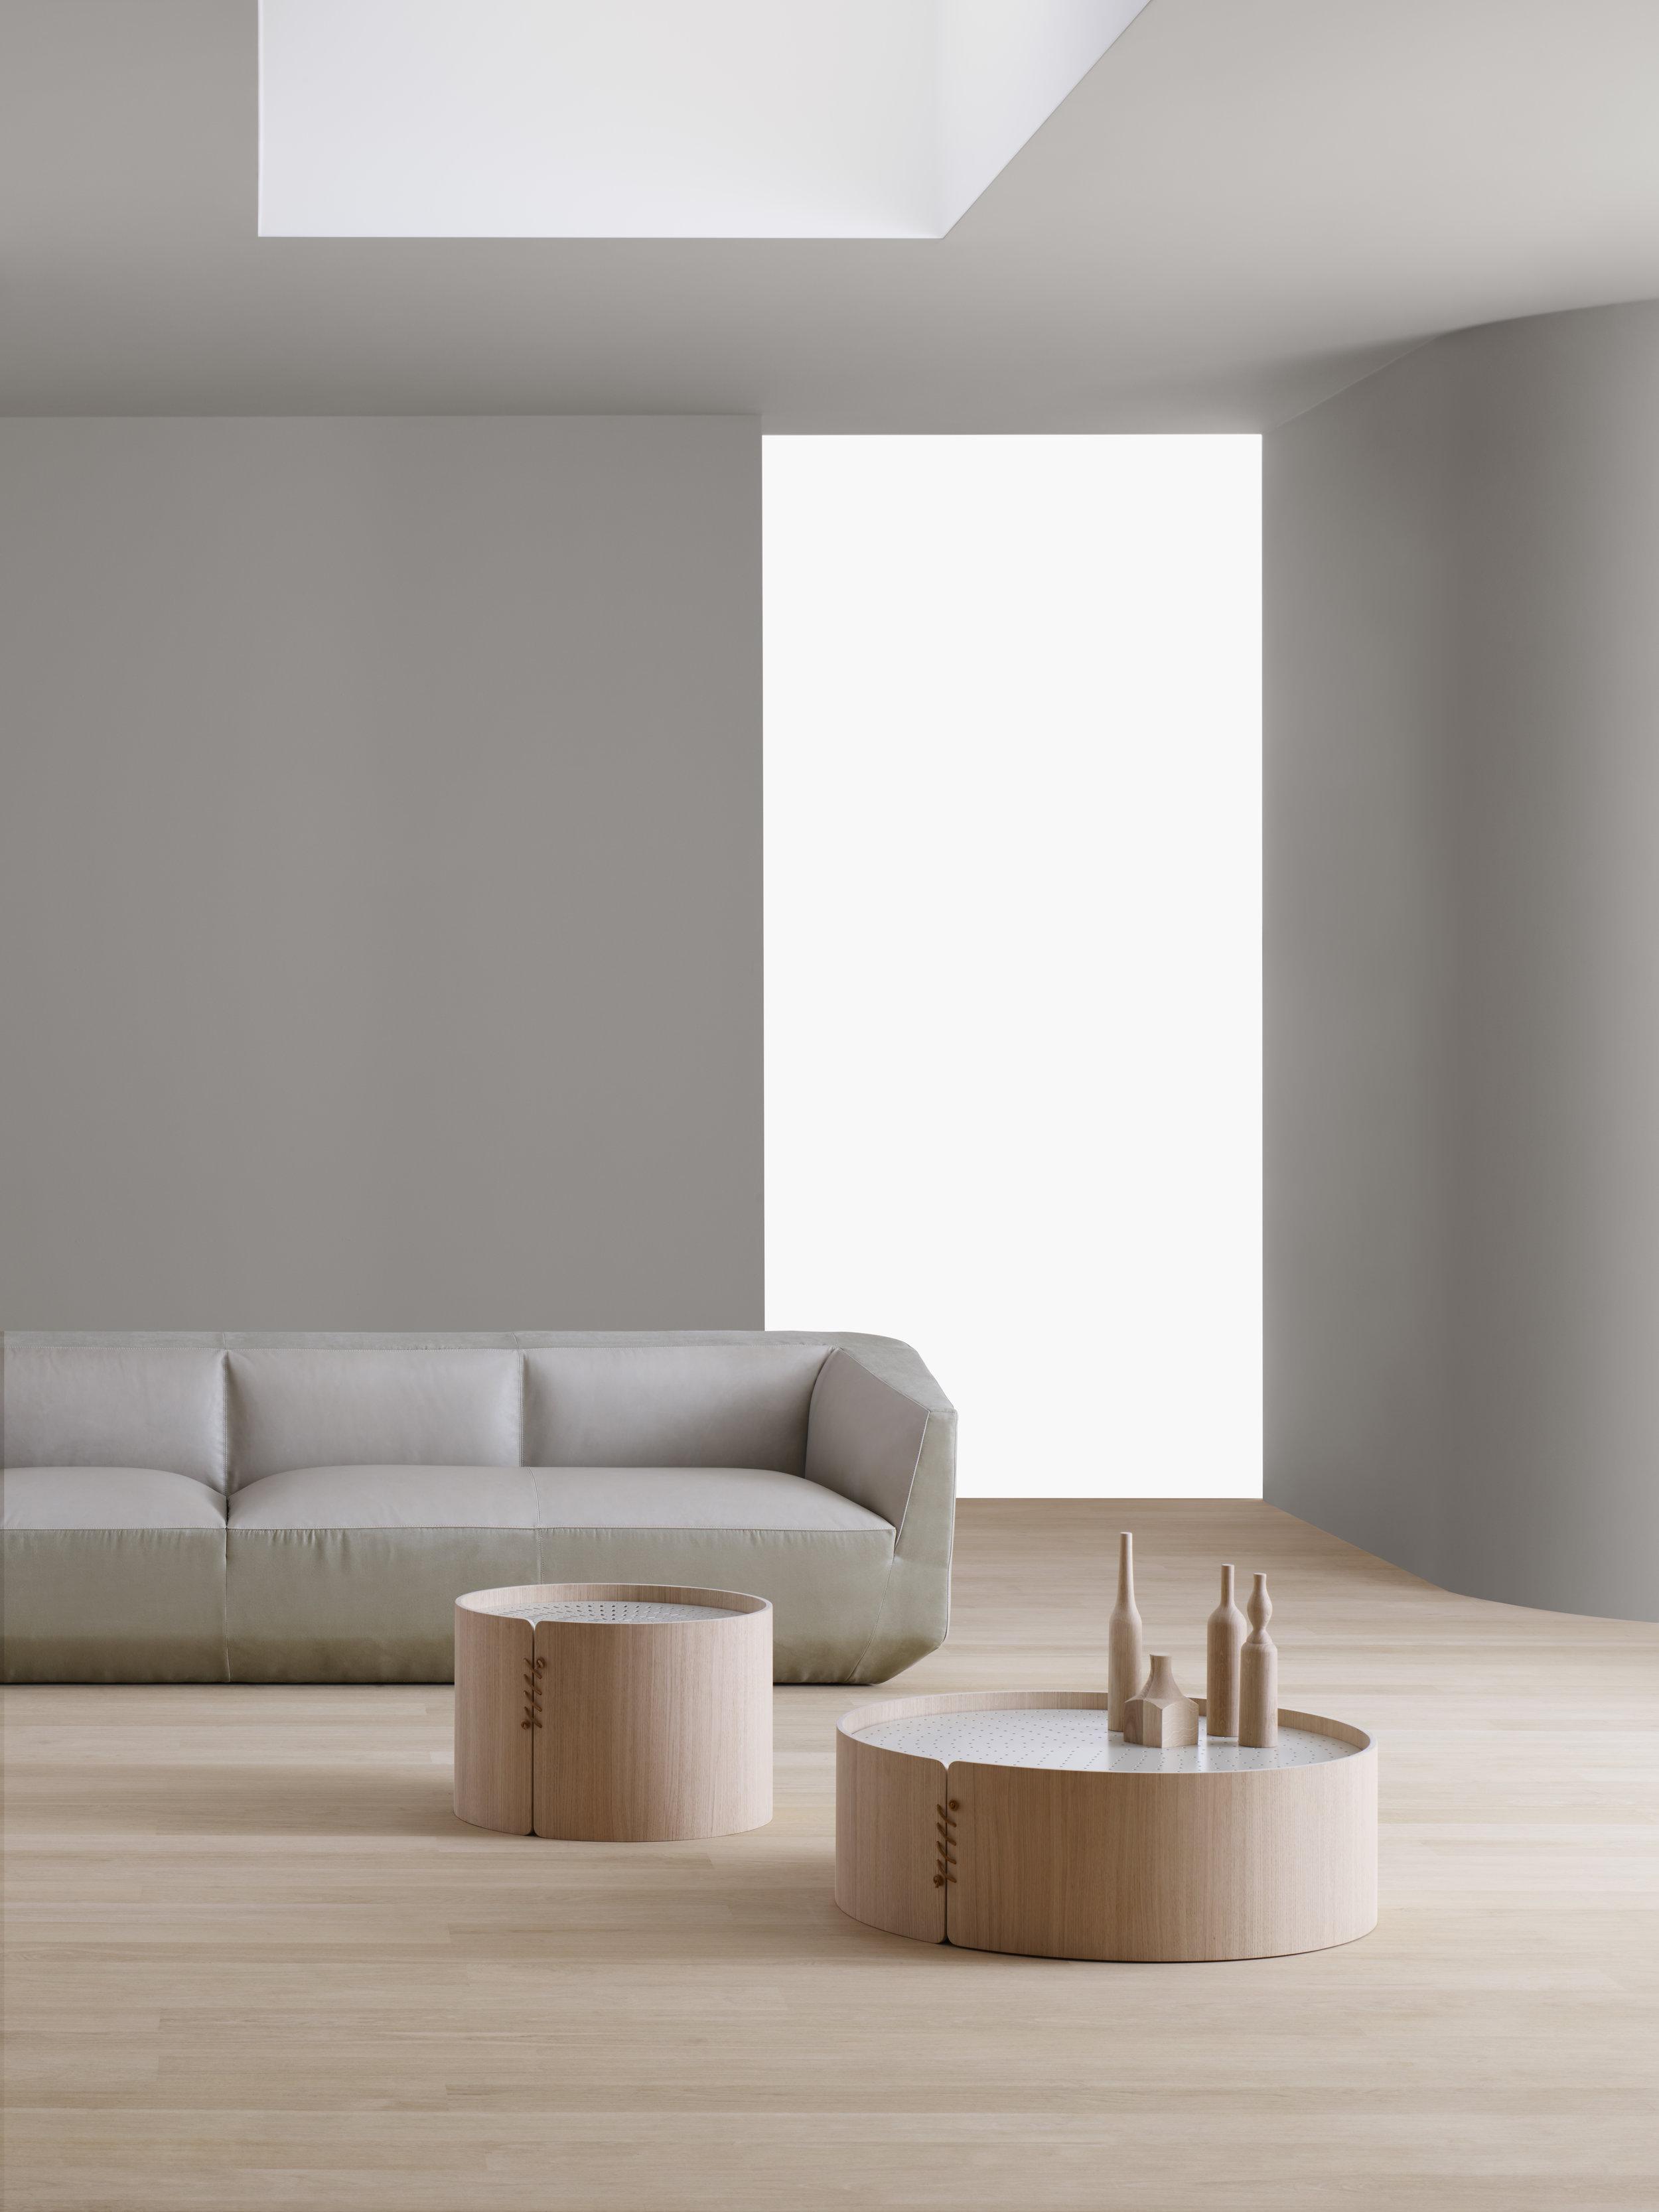 Panis sofa ⓒ Amura